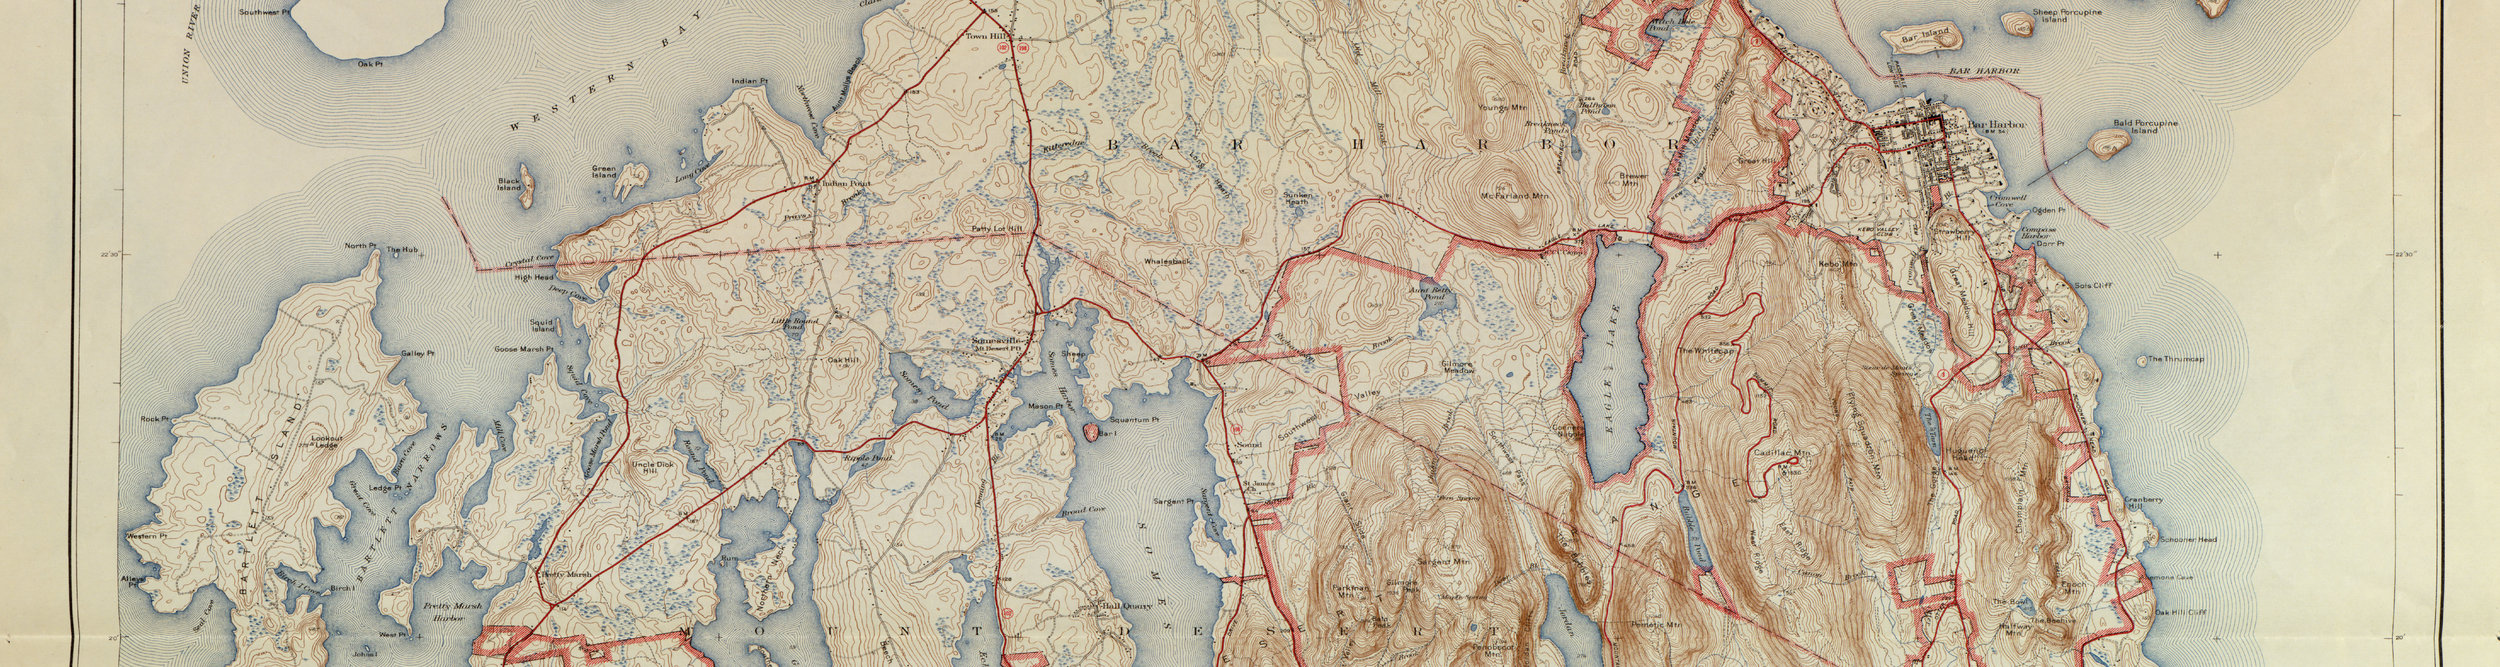 Acadia National Park Map 1942